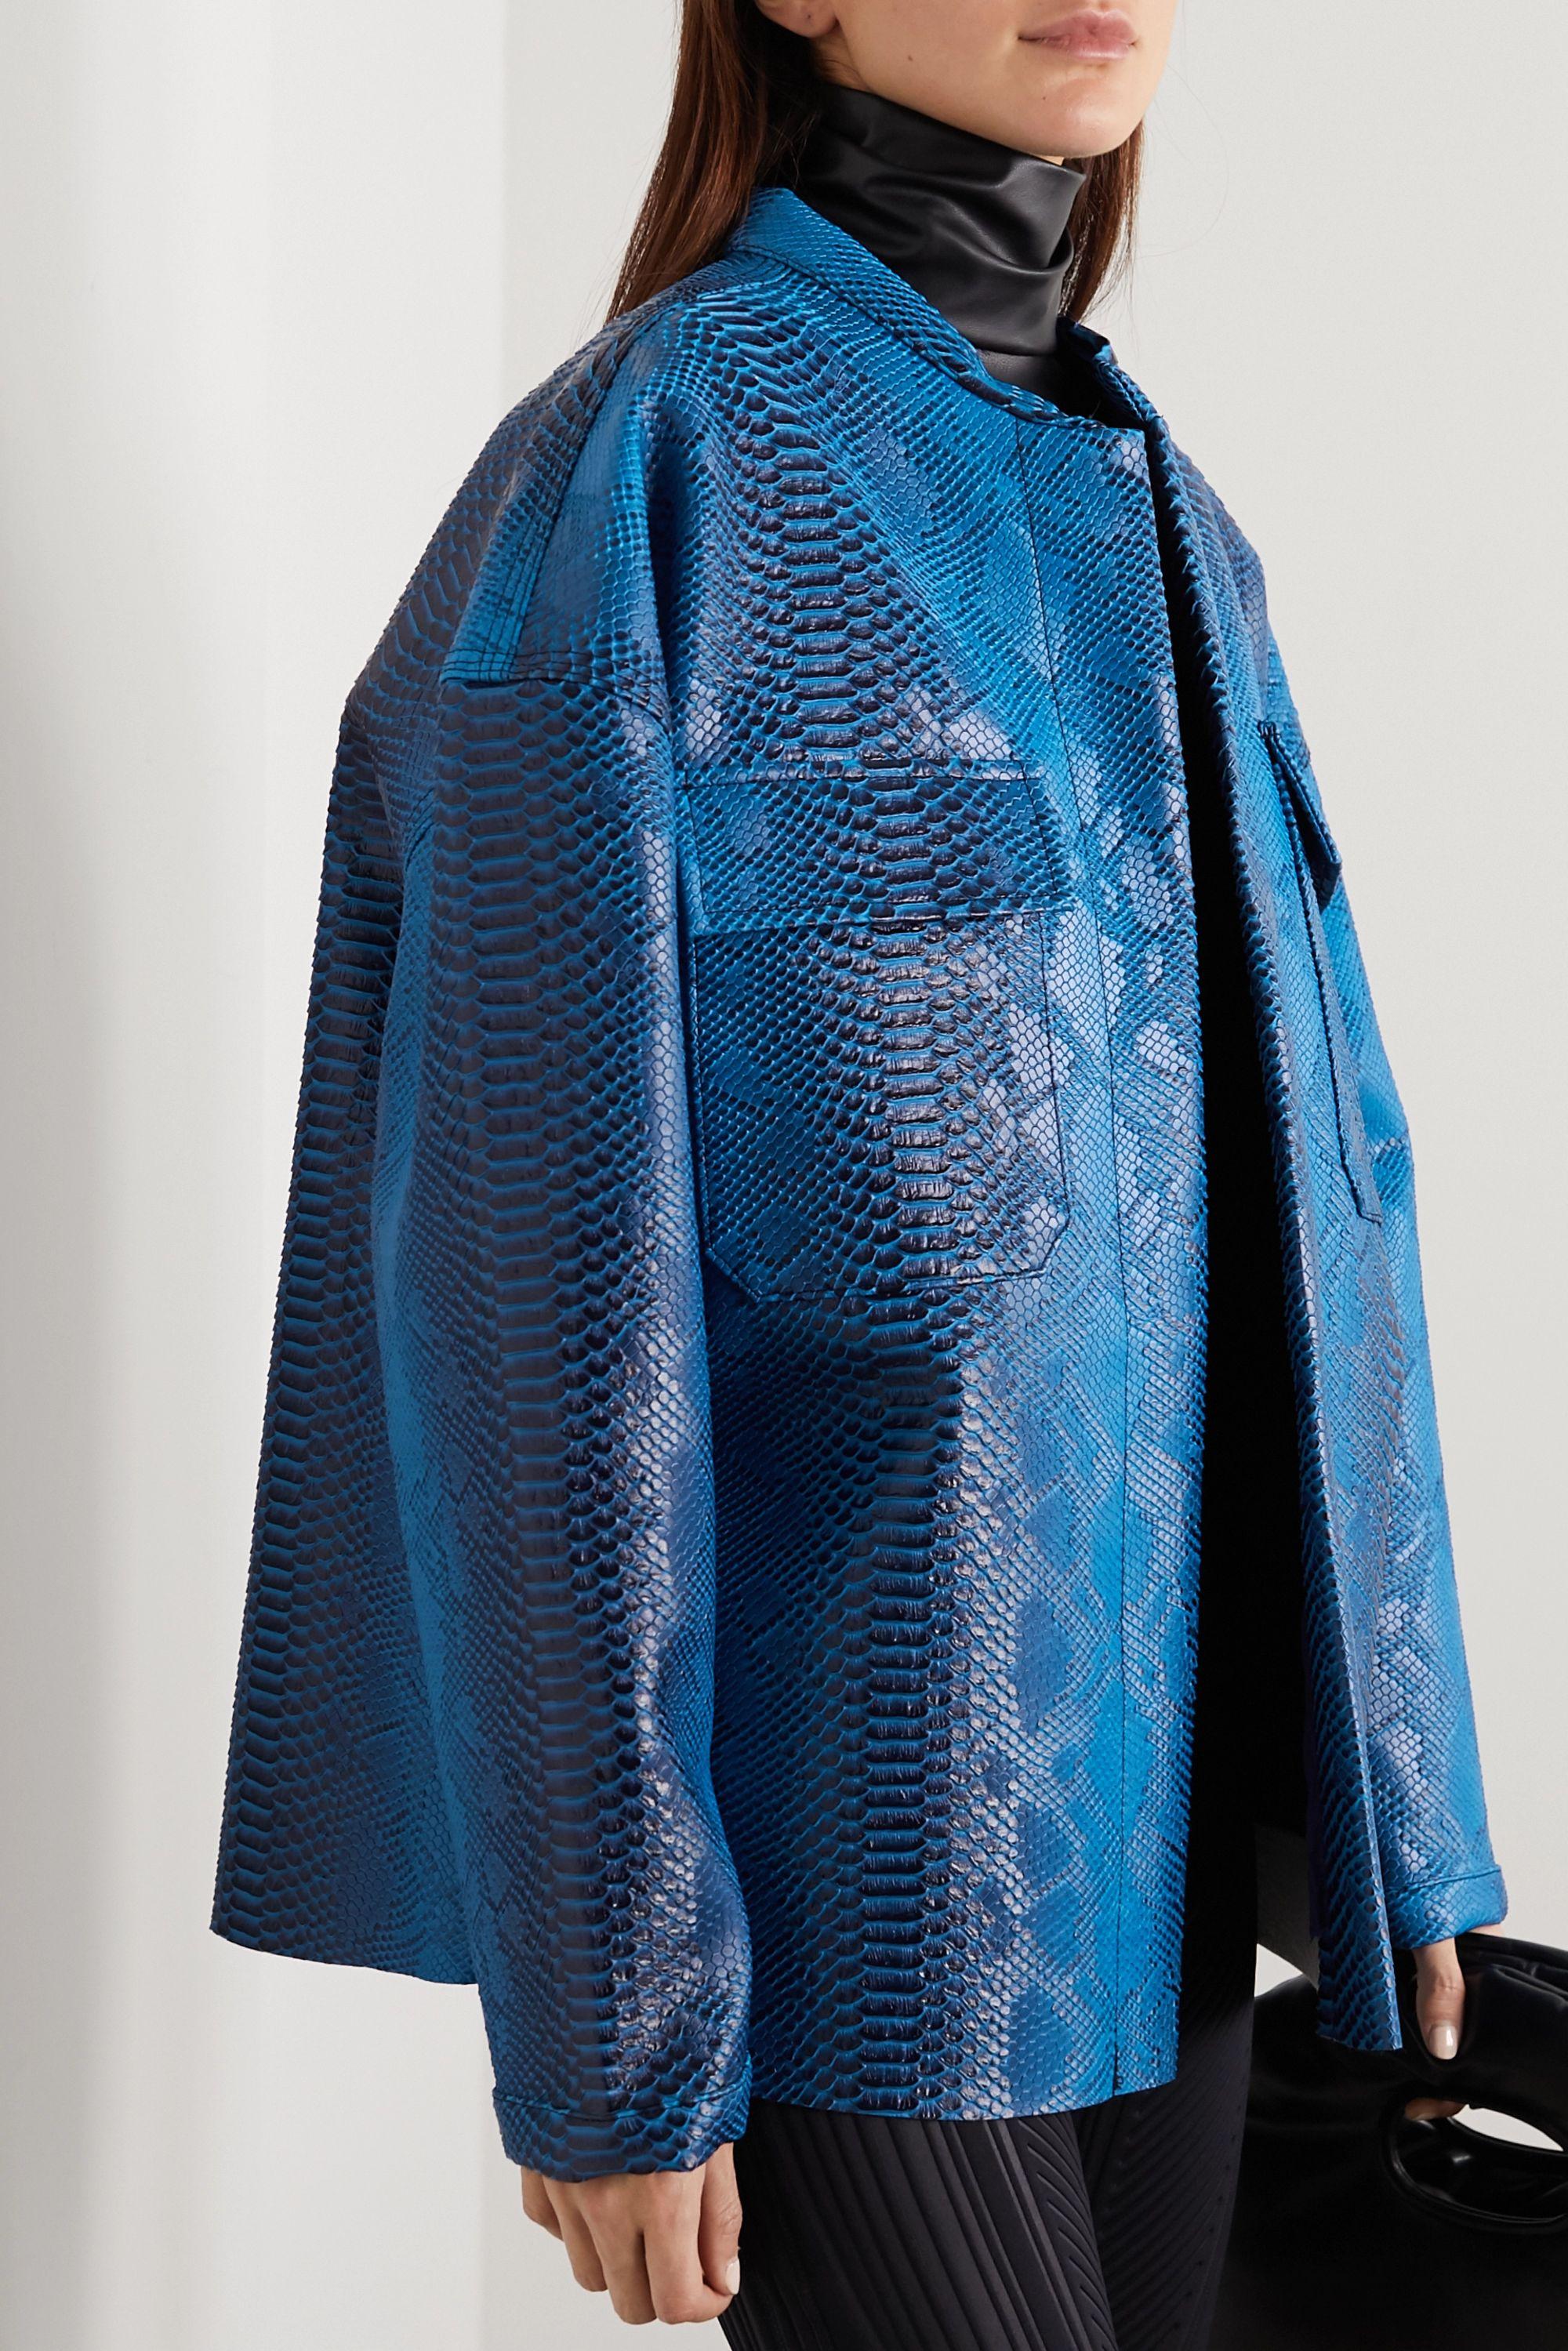 Maisie Wilen Oversized snake-effect vinyl jacket